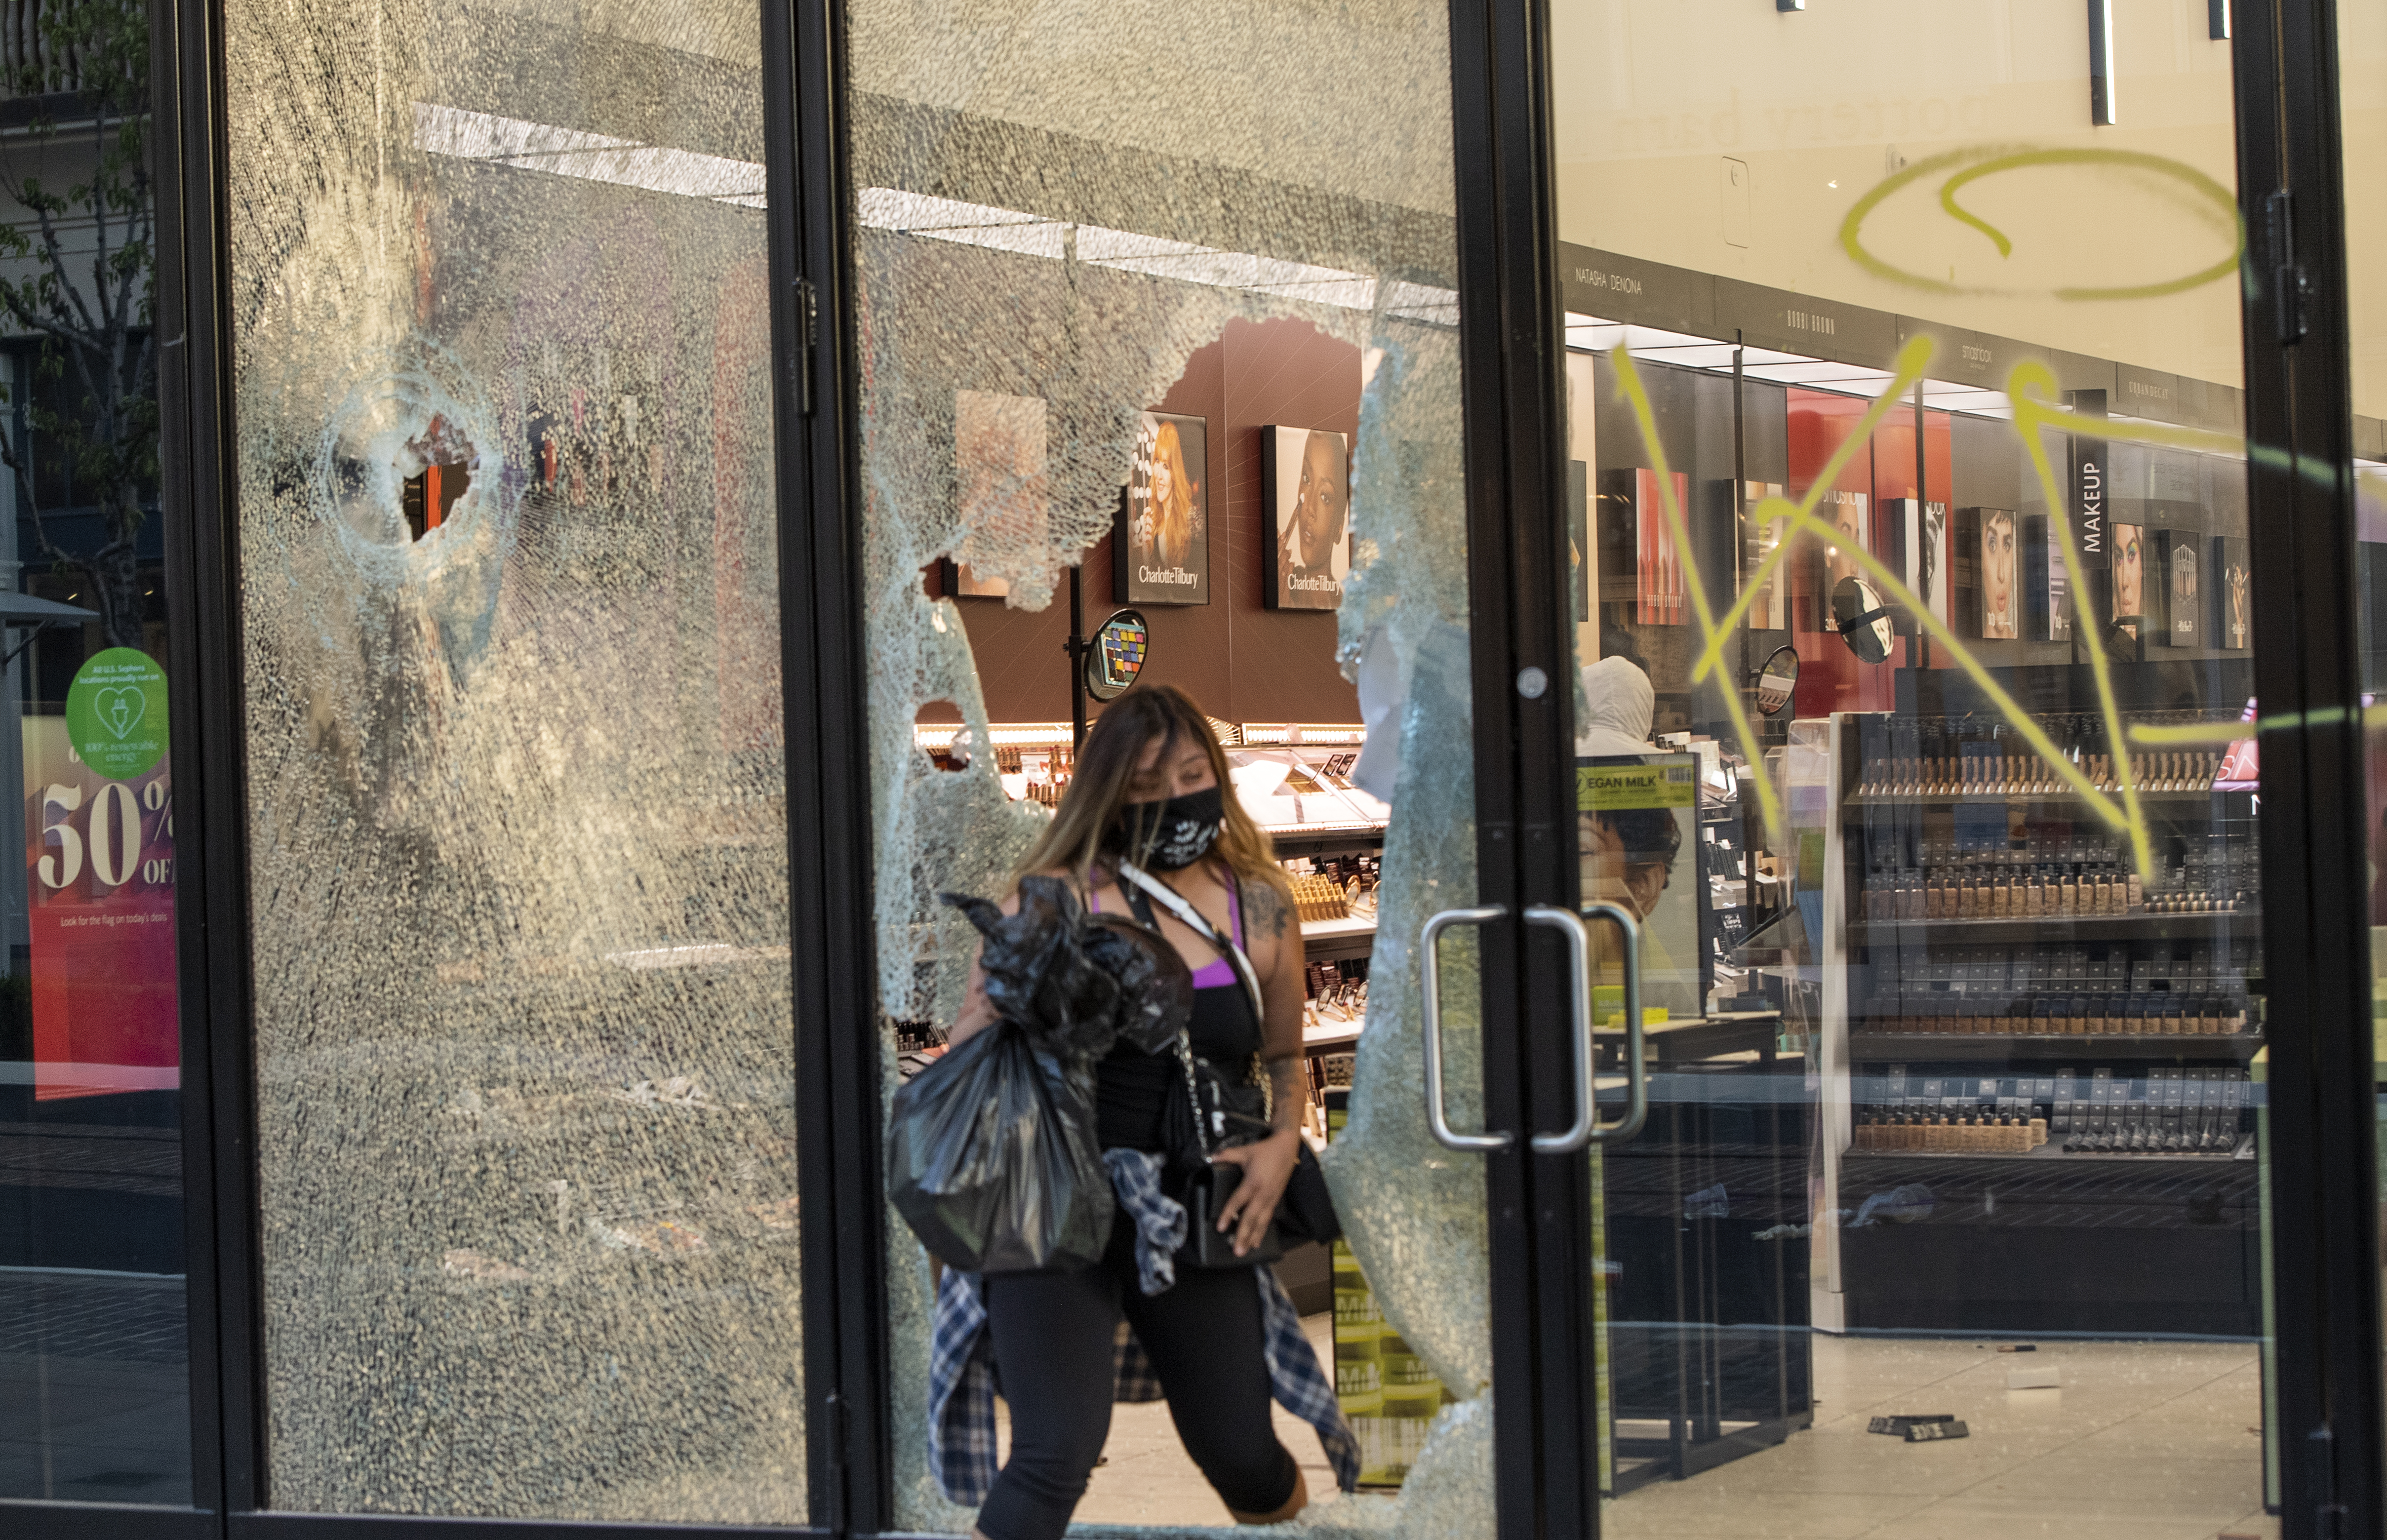 Mensen vernielen winkels en stelen.